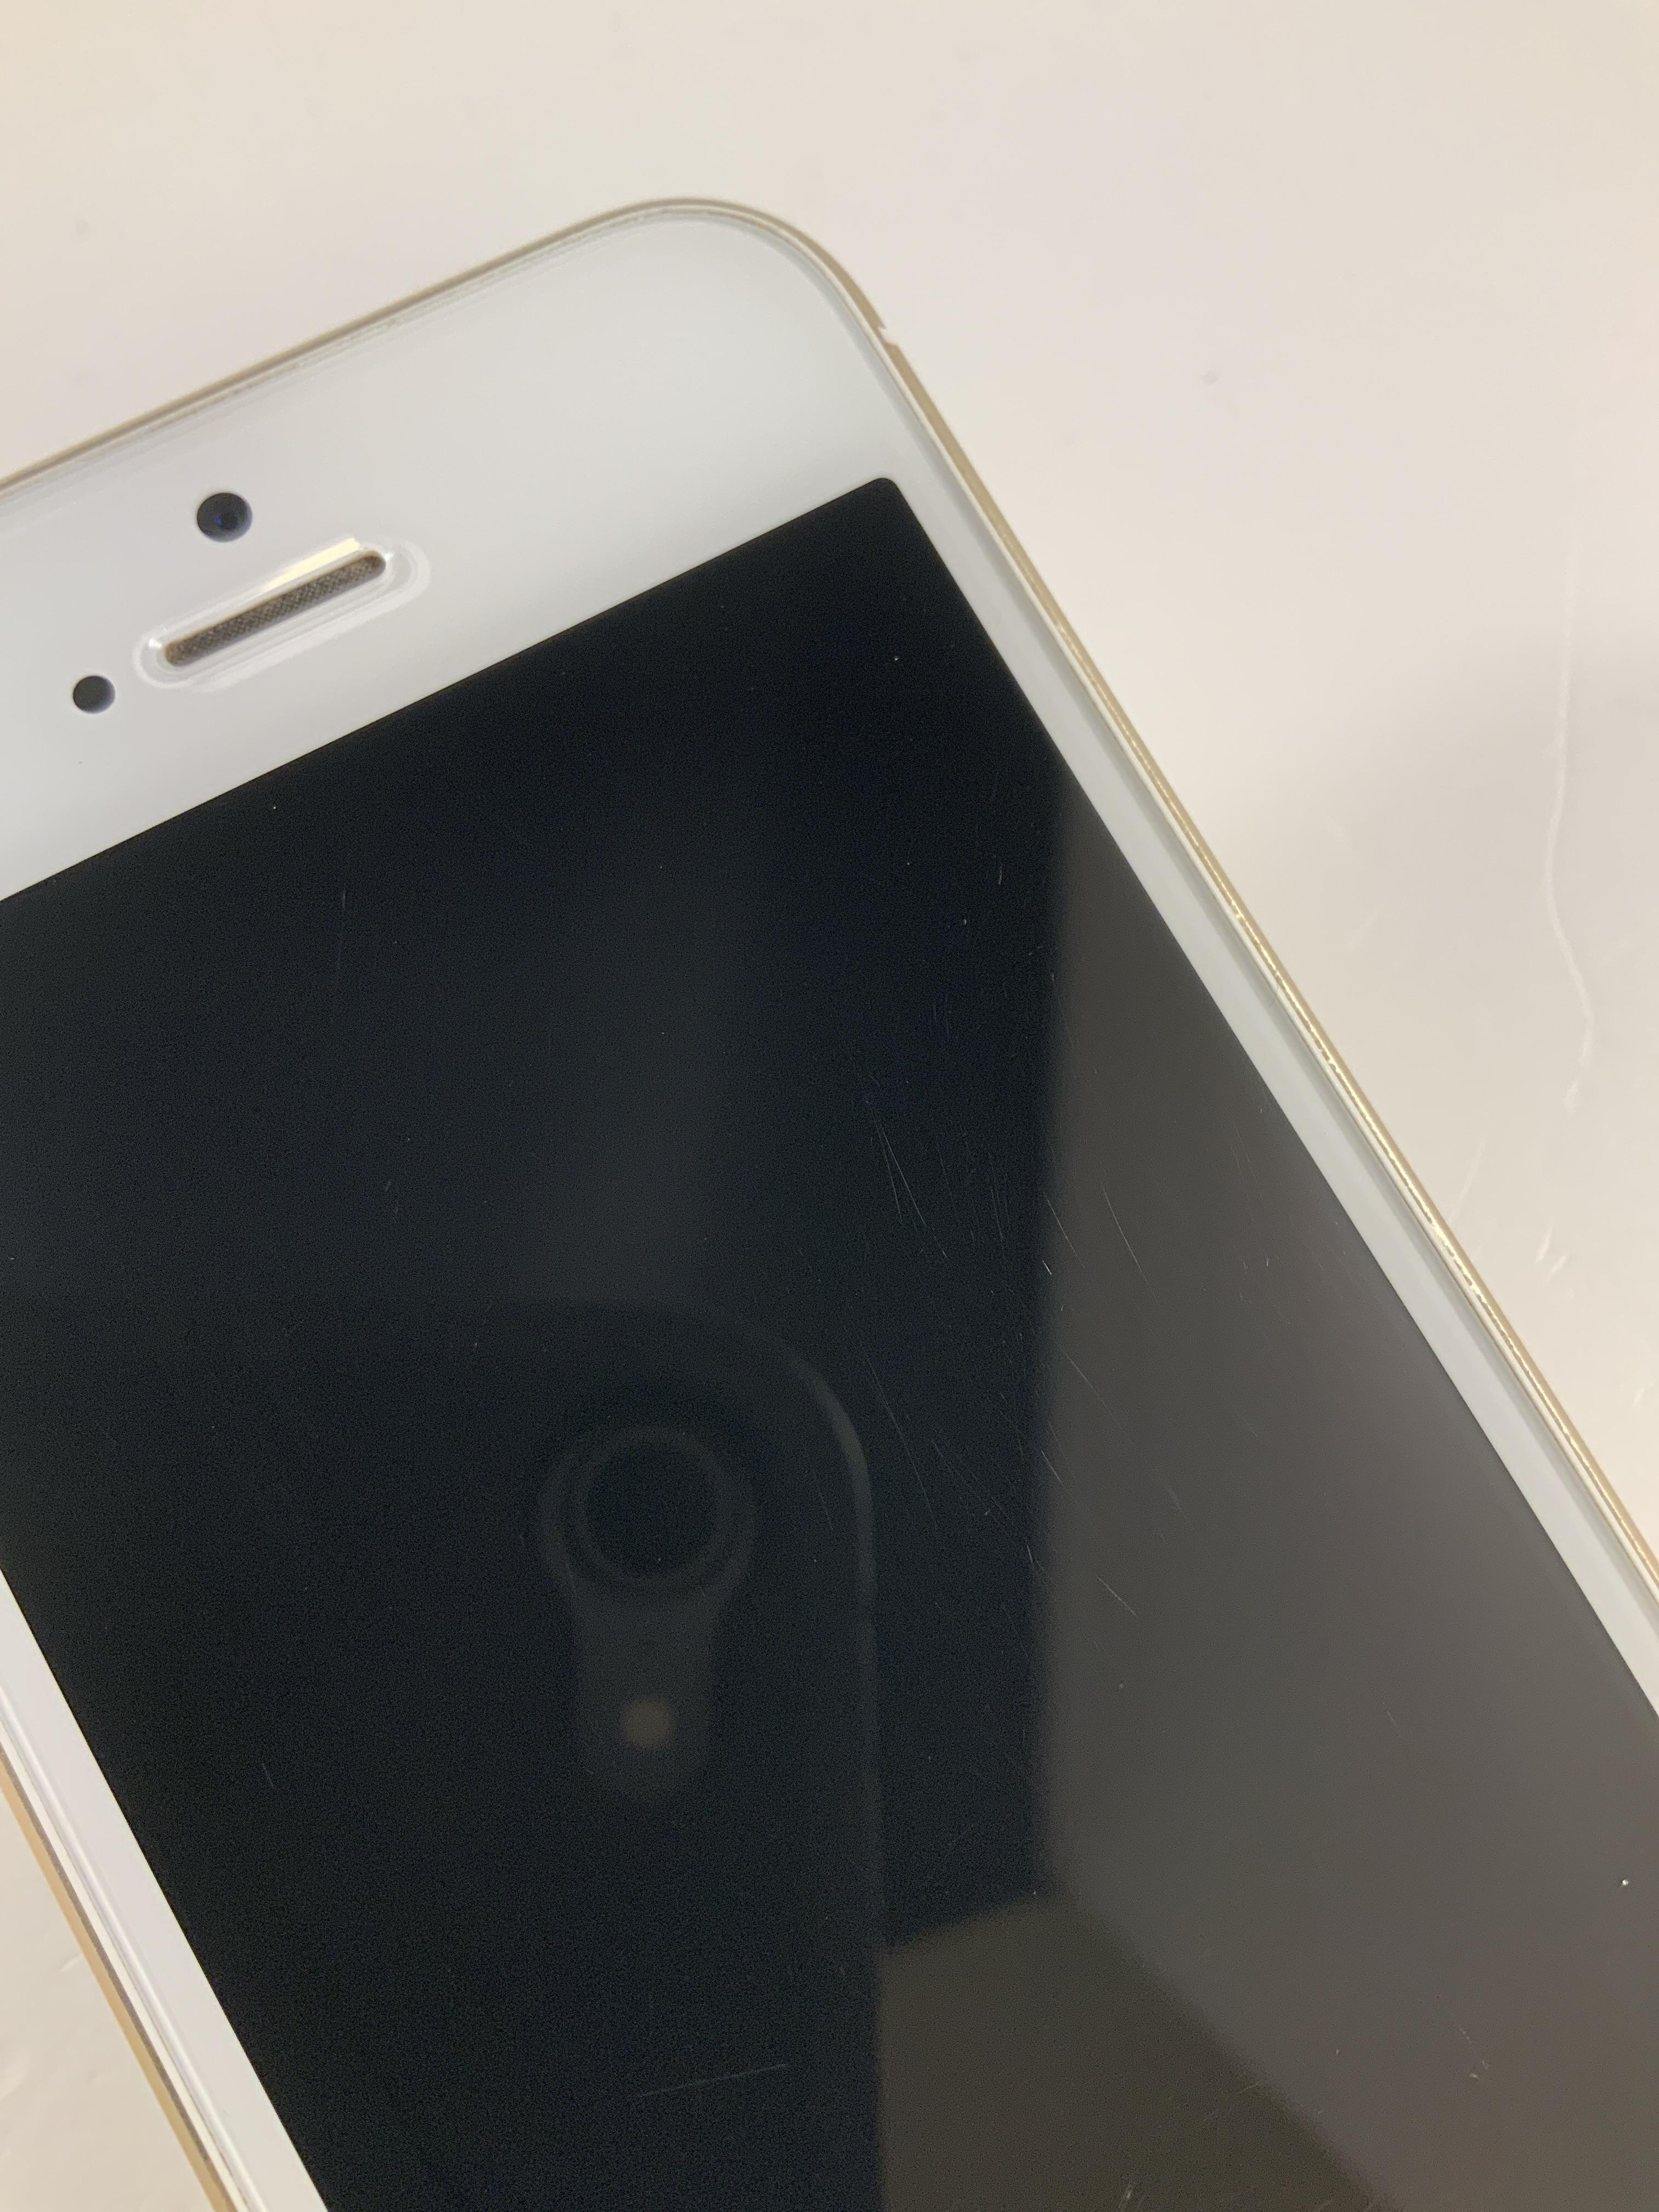 iPhone SE 16GB, 16GB, Gold, image 3